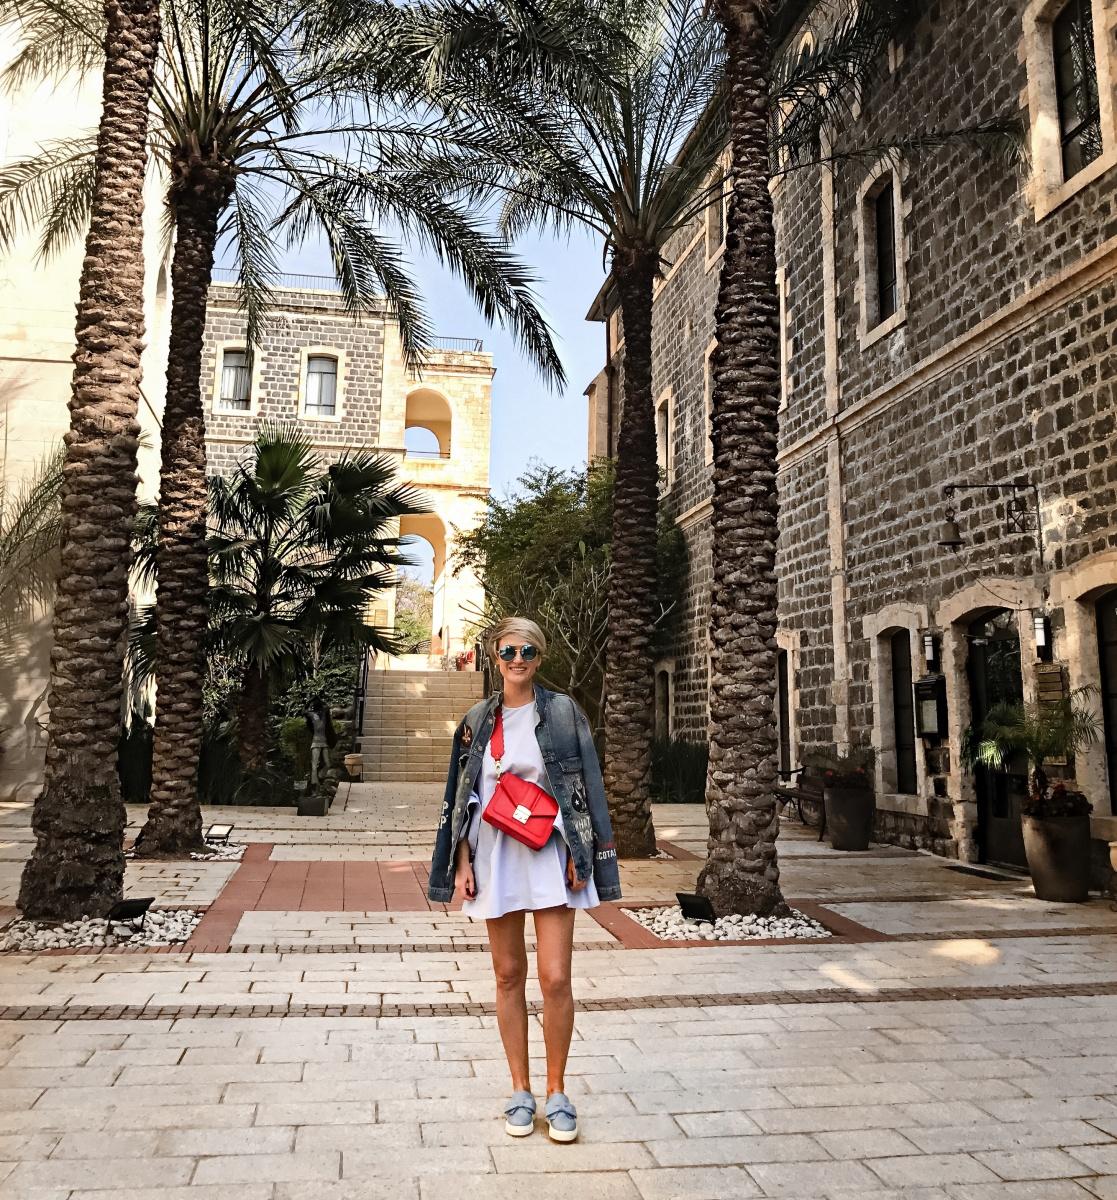 scotts hotel, tiberias